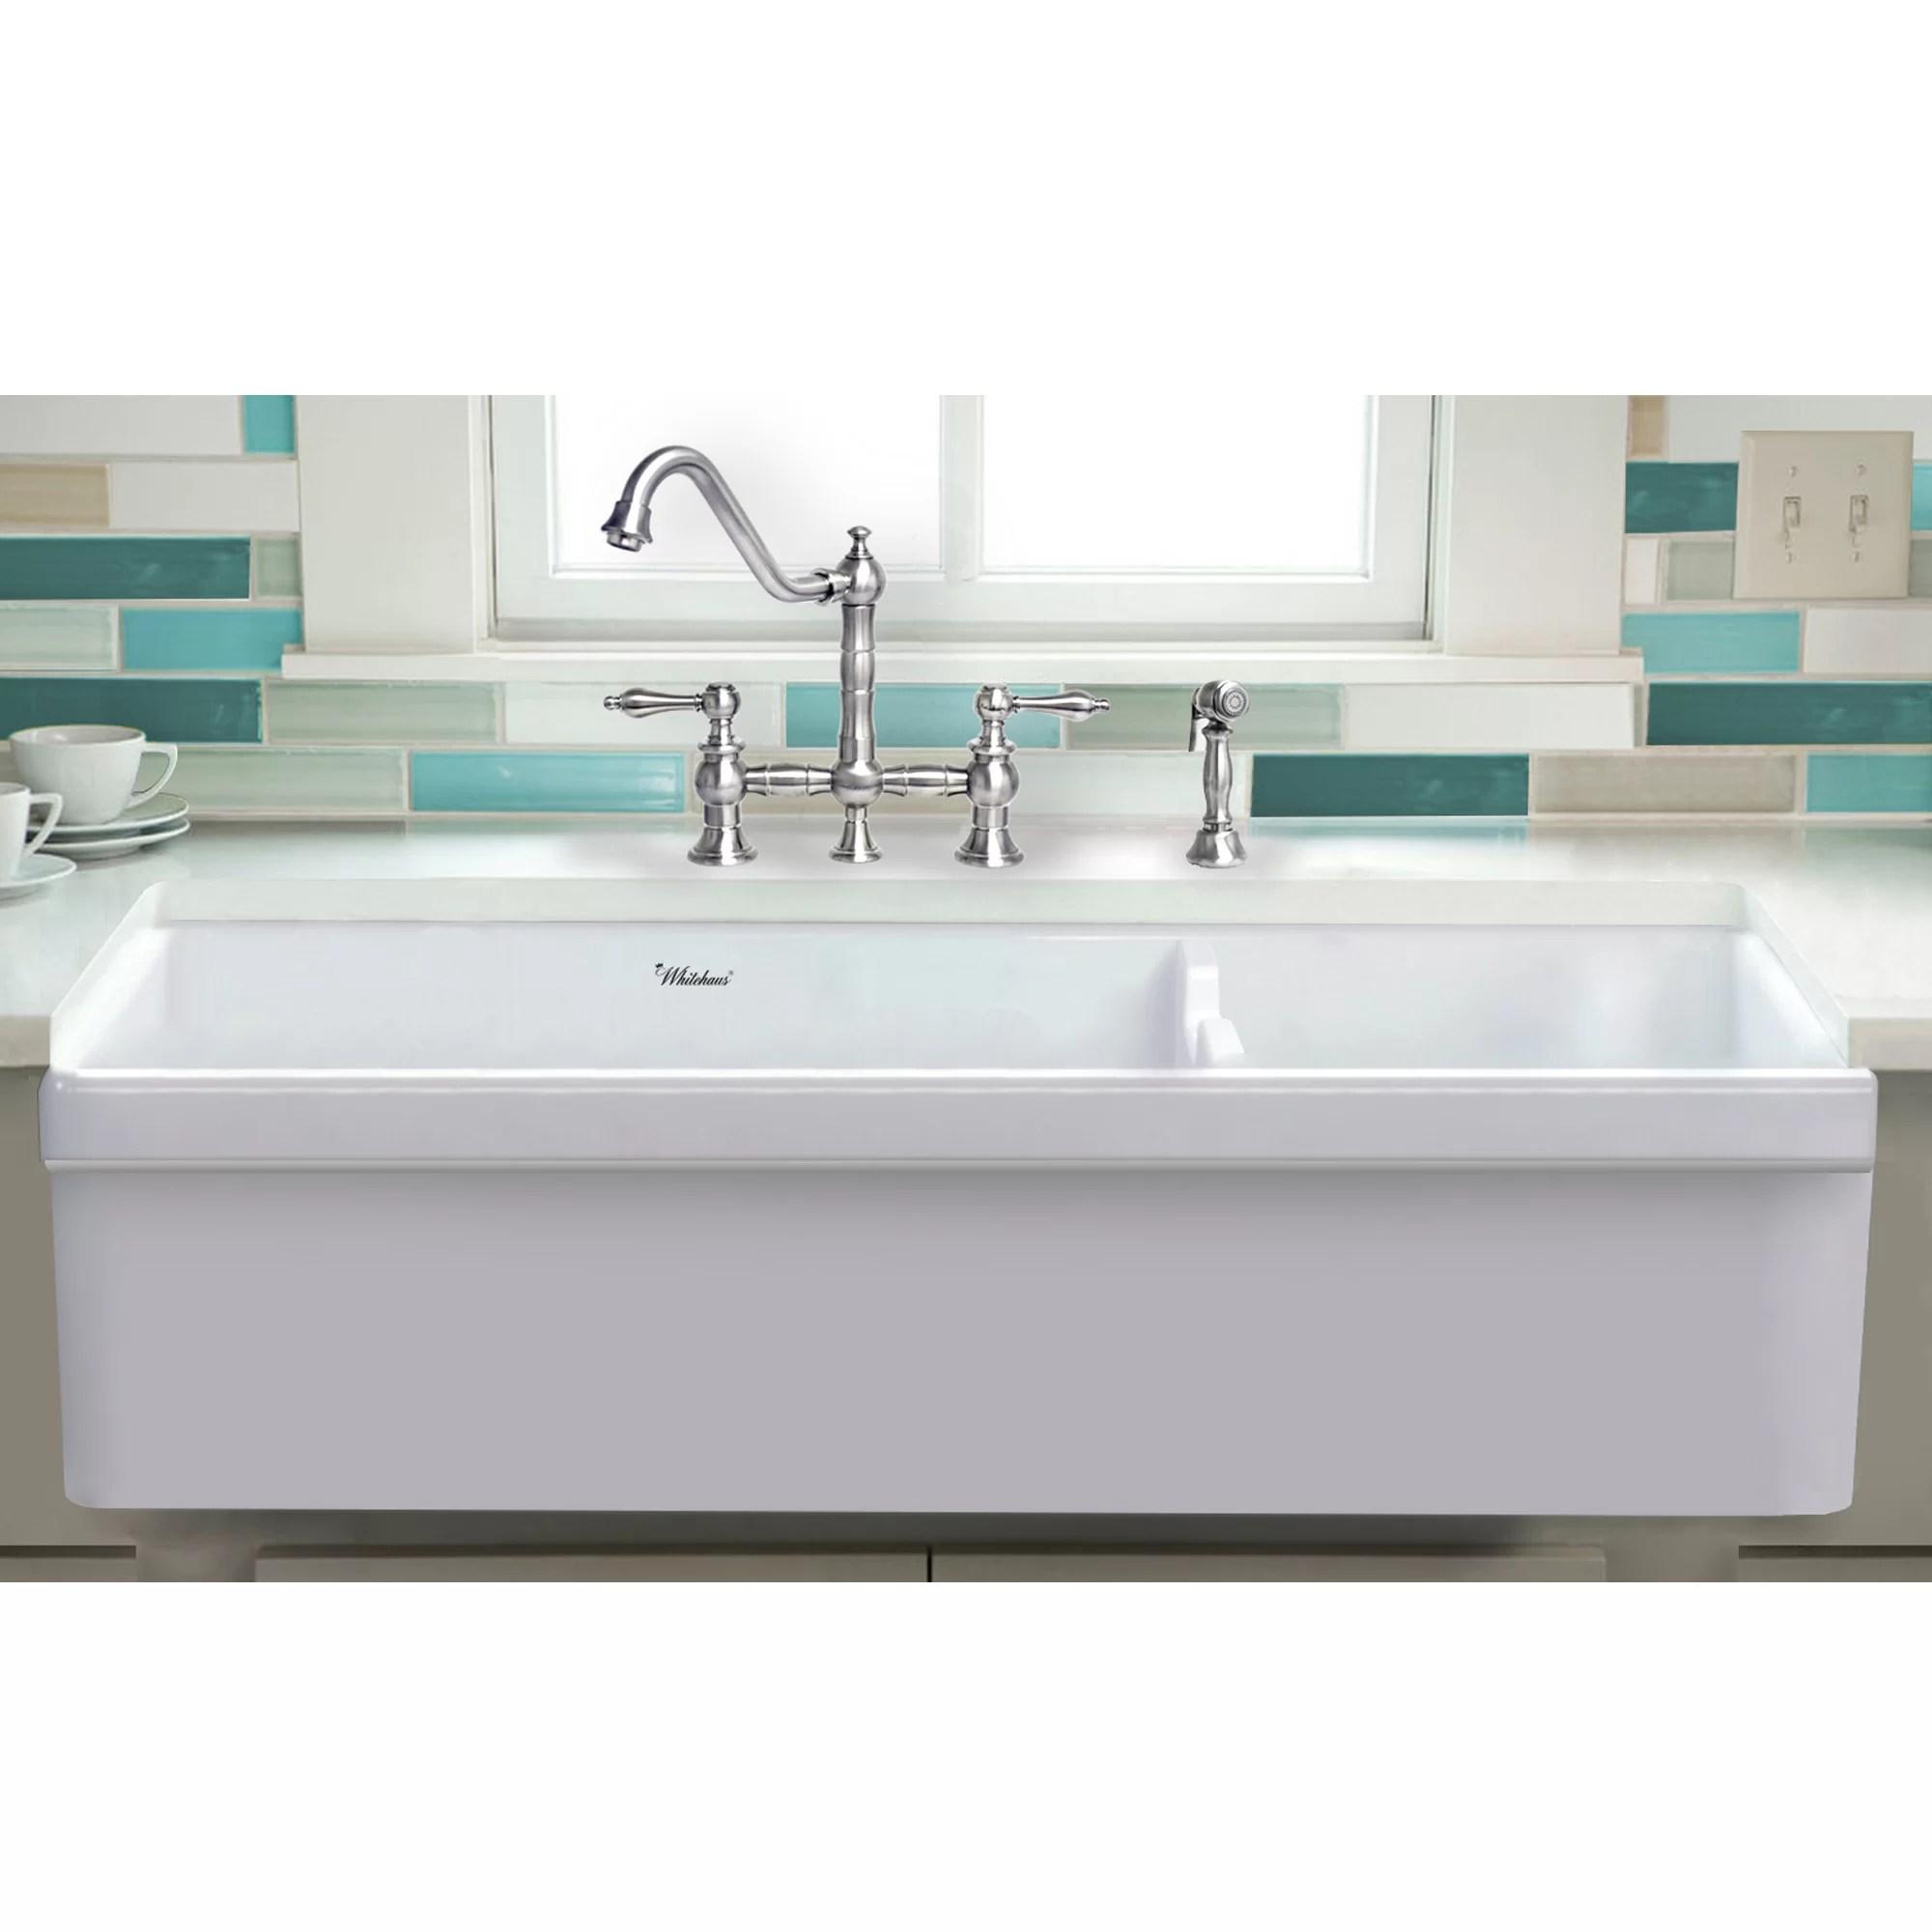 Whitehaus Collection Glencove 42 L X 19 W Double Basin Farmhouse Apron Kitchen Sink Reviews Wayfair